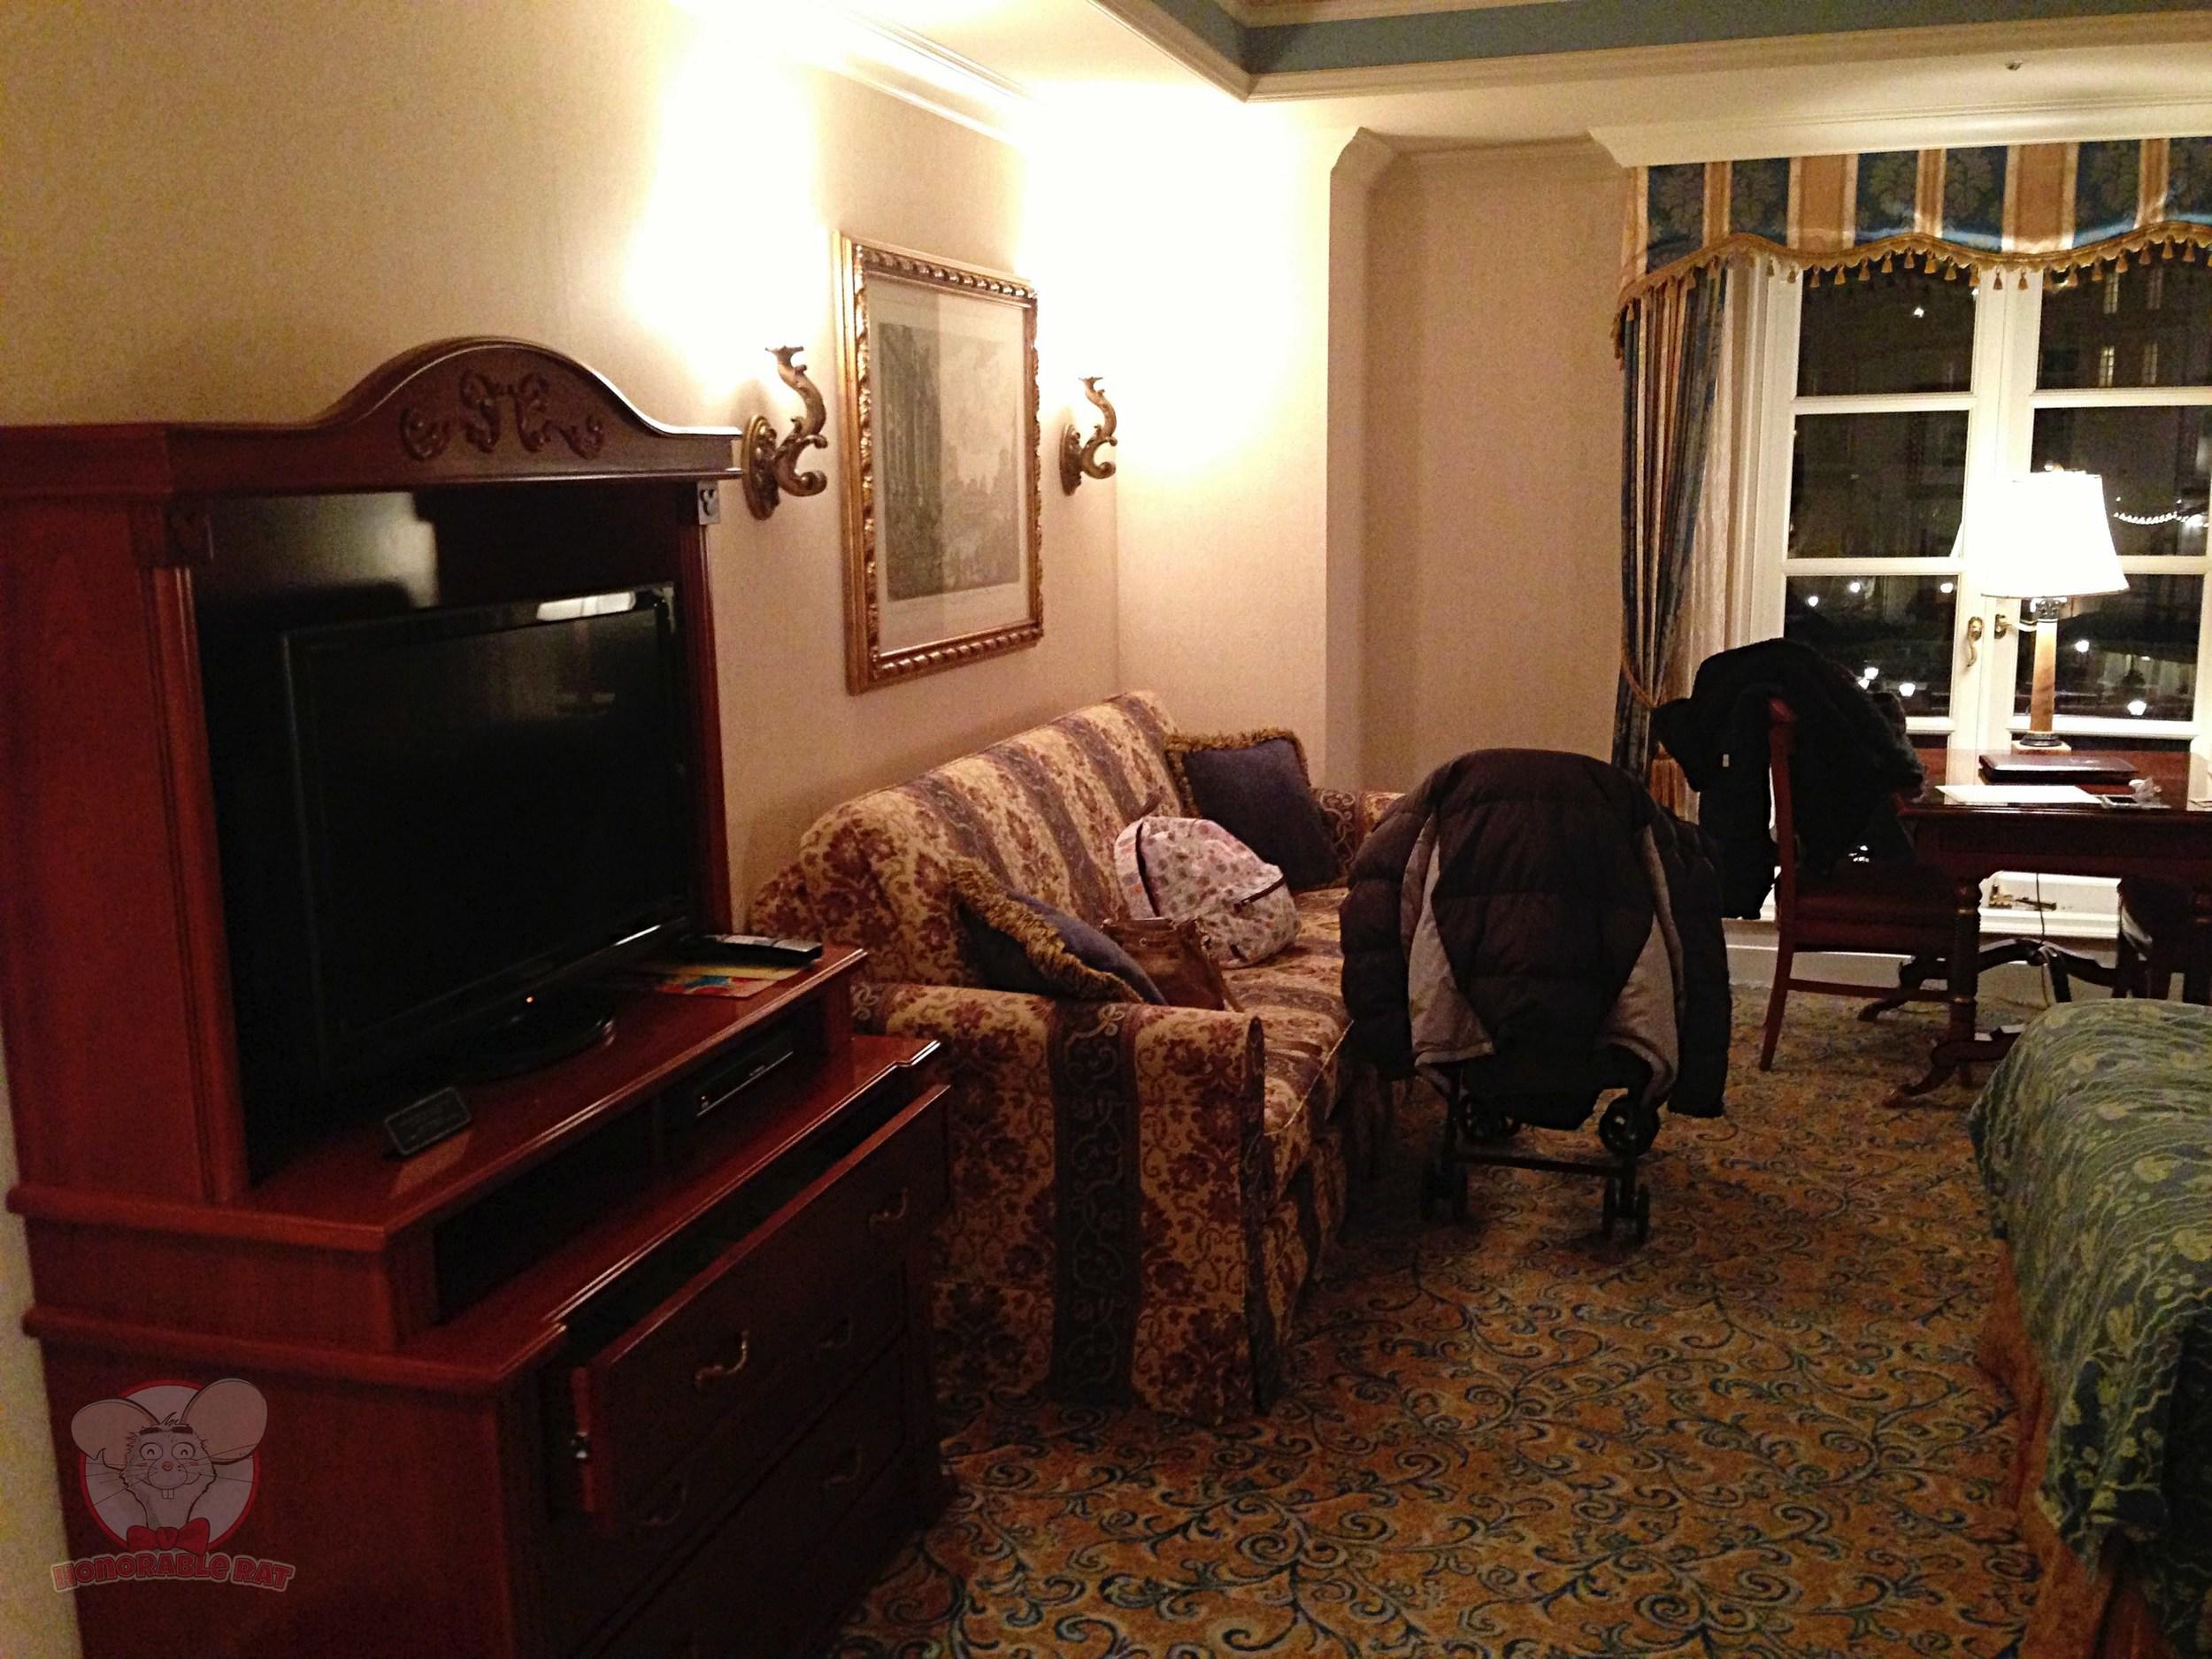 Television and sofa